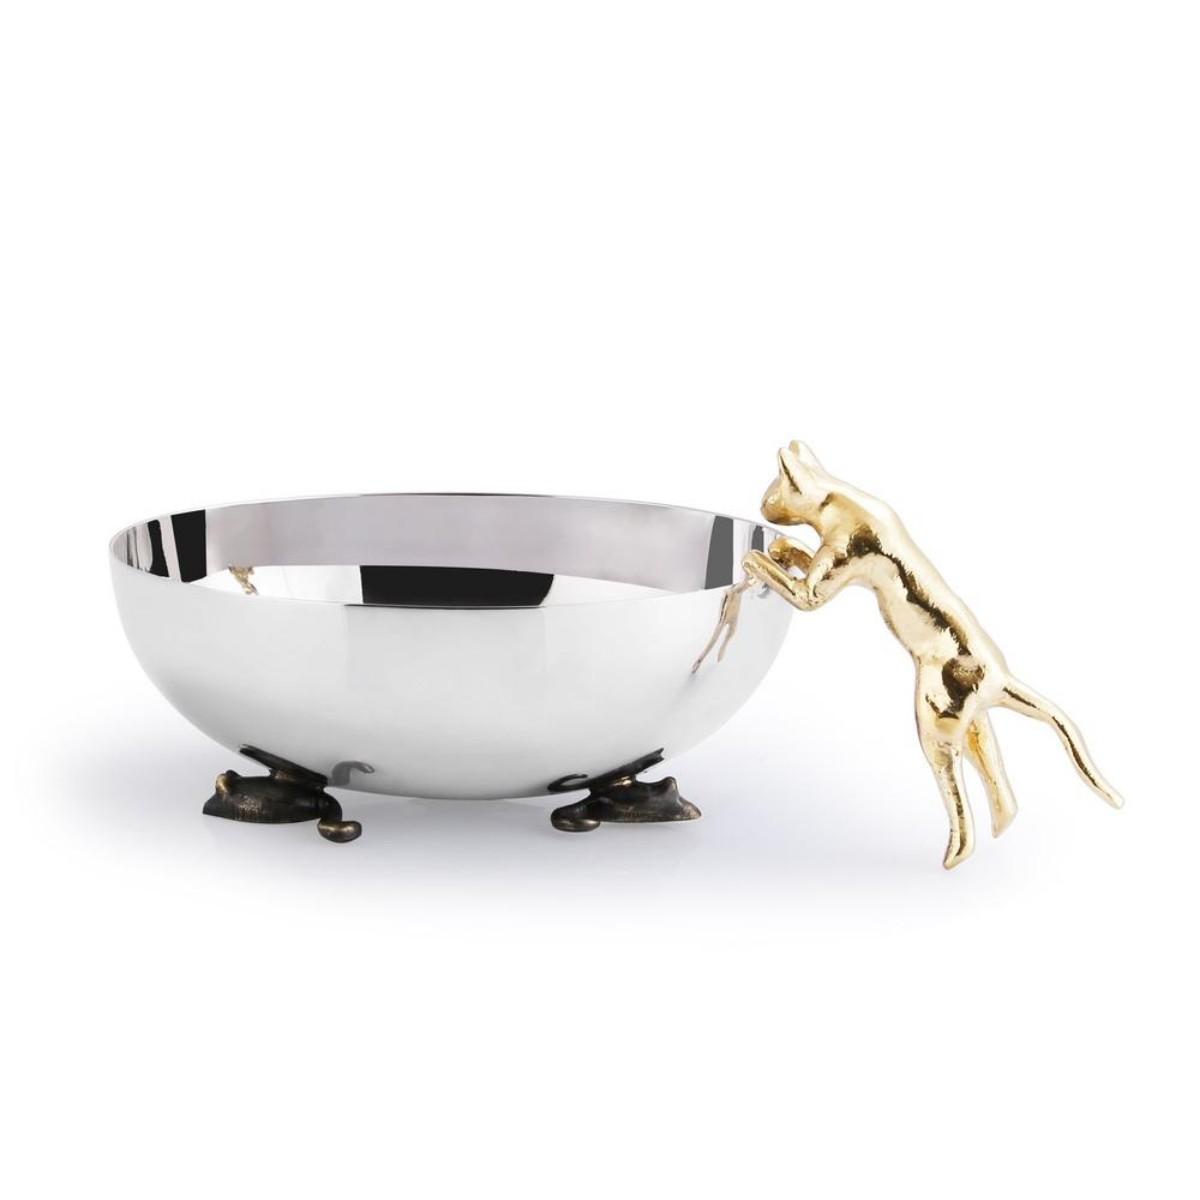 Michael Aram I Cat & Mouse Dish